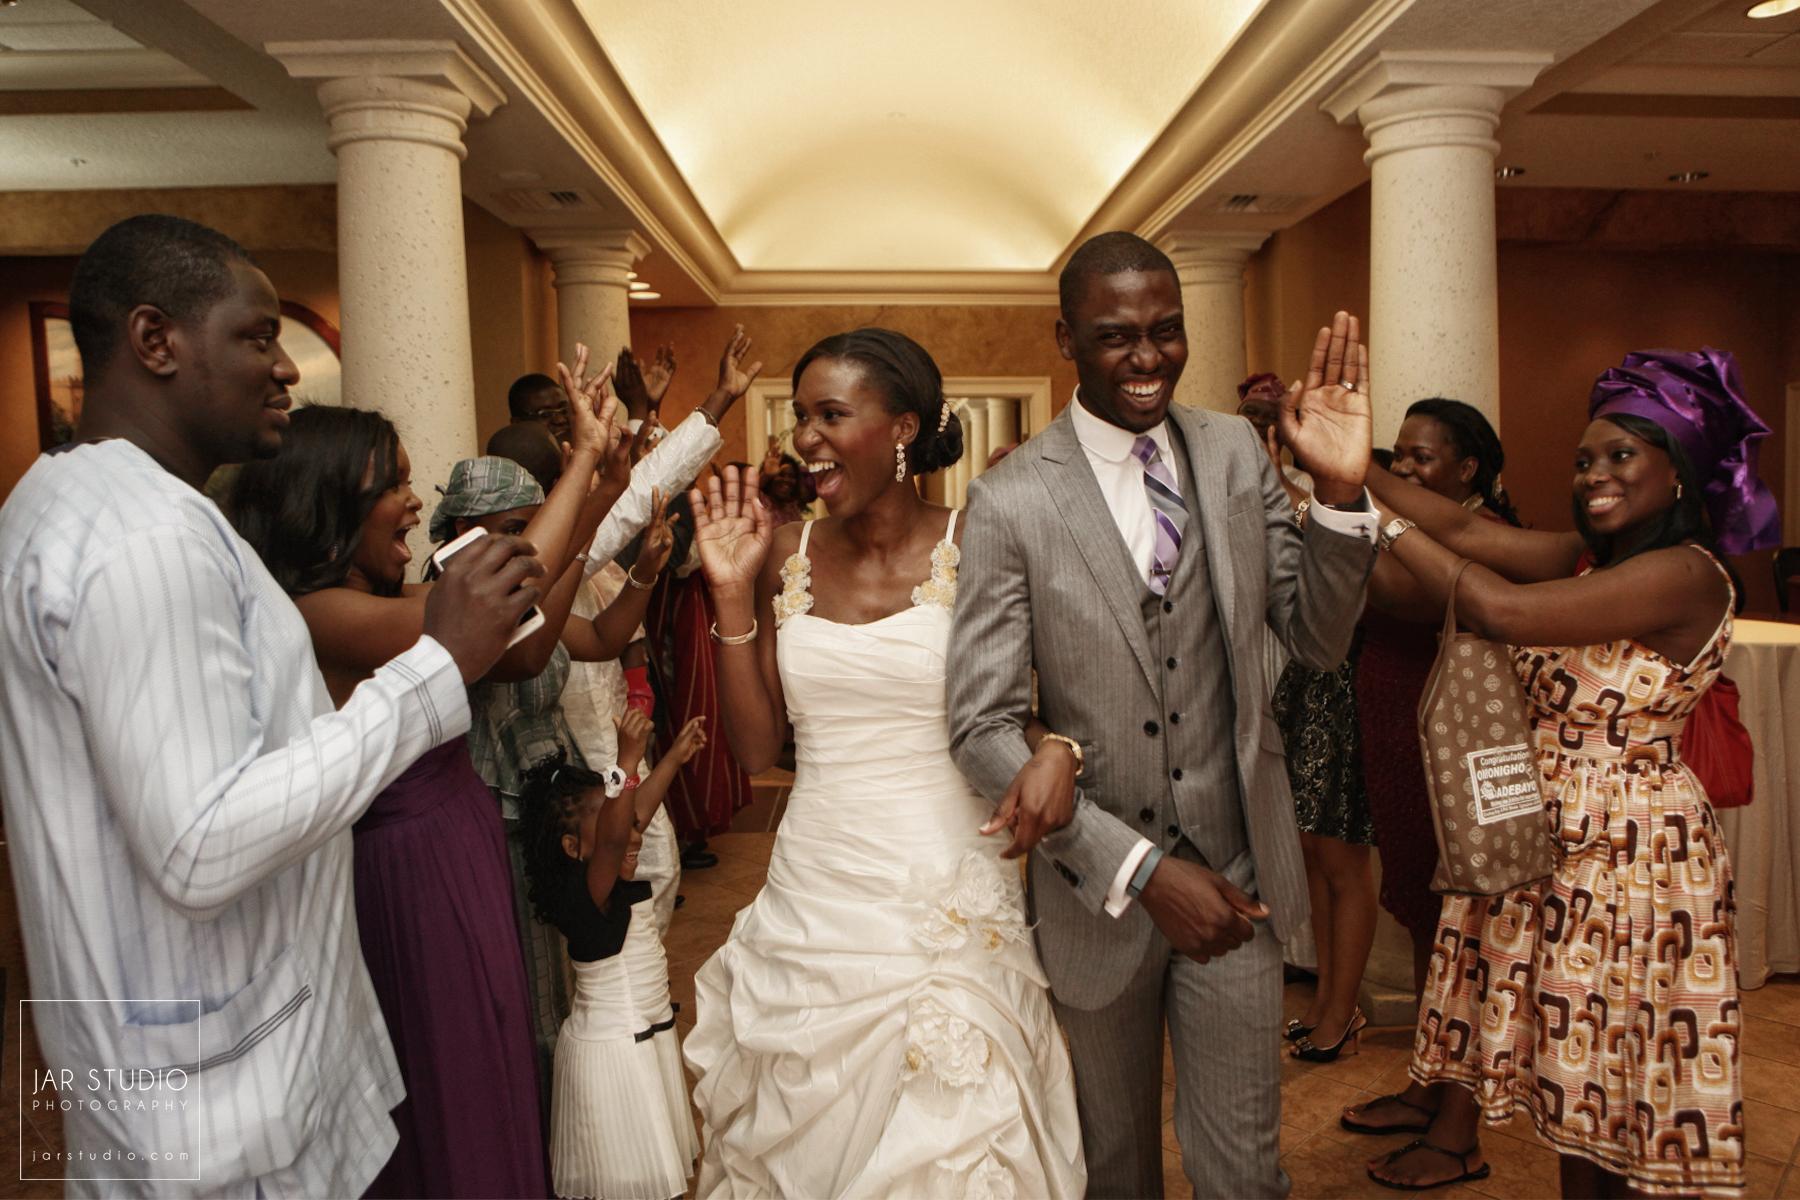 38-hilton-tuscanu-bride-groom-send-out-events-wedding-photographer-jarstudio.JPG